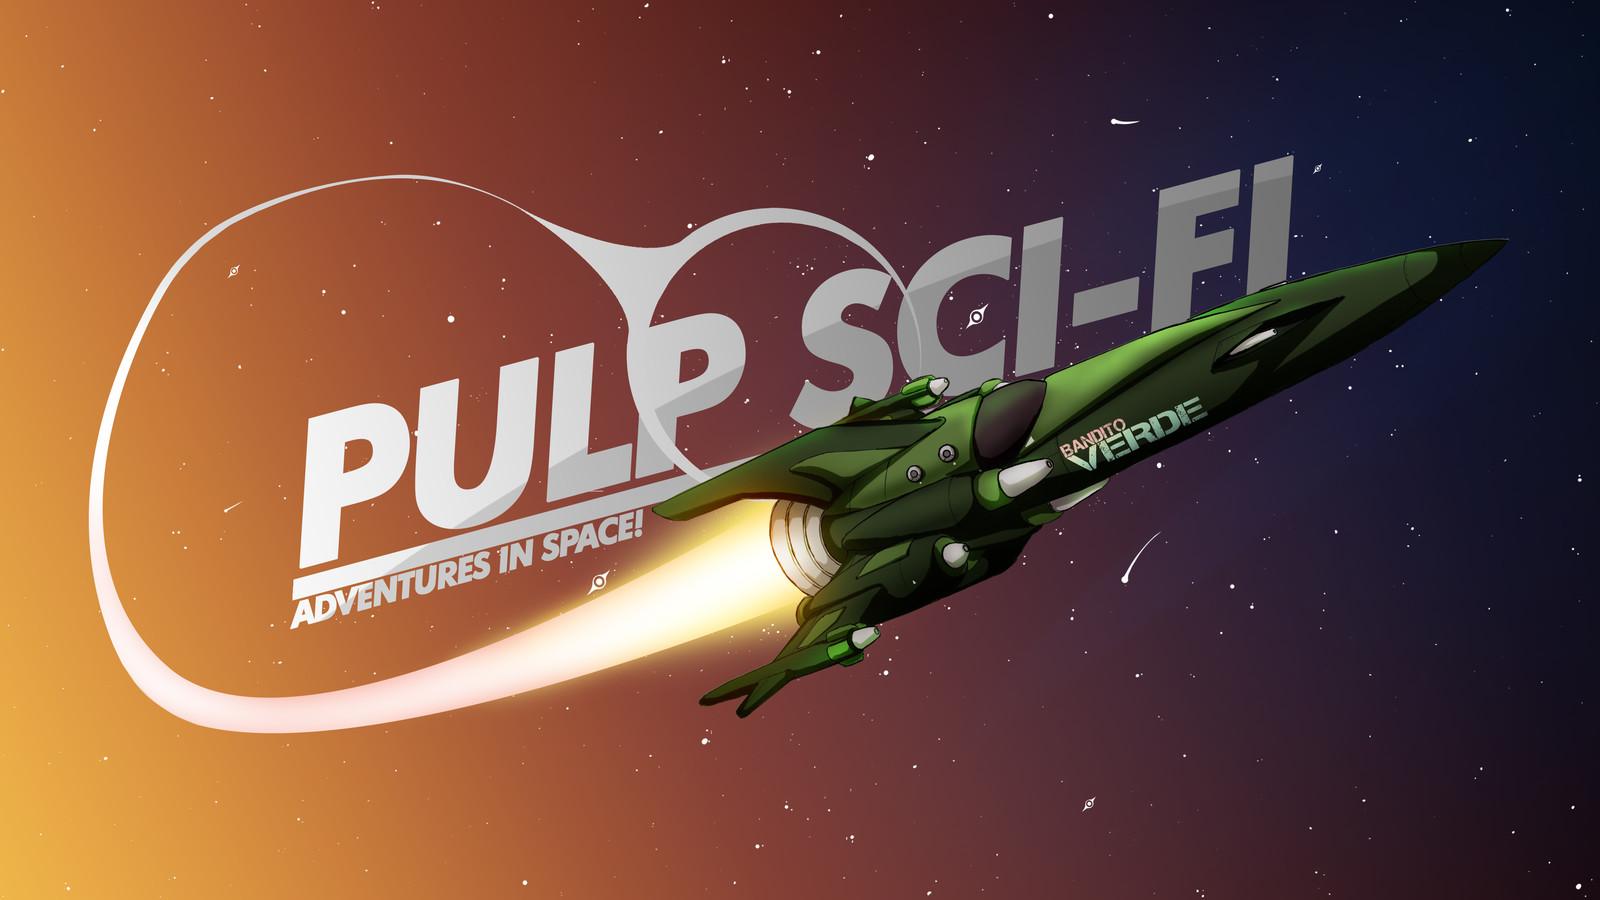 Pulp Sci-Fi Adventures in Space!